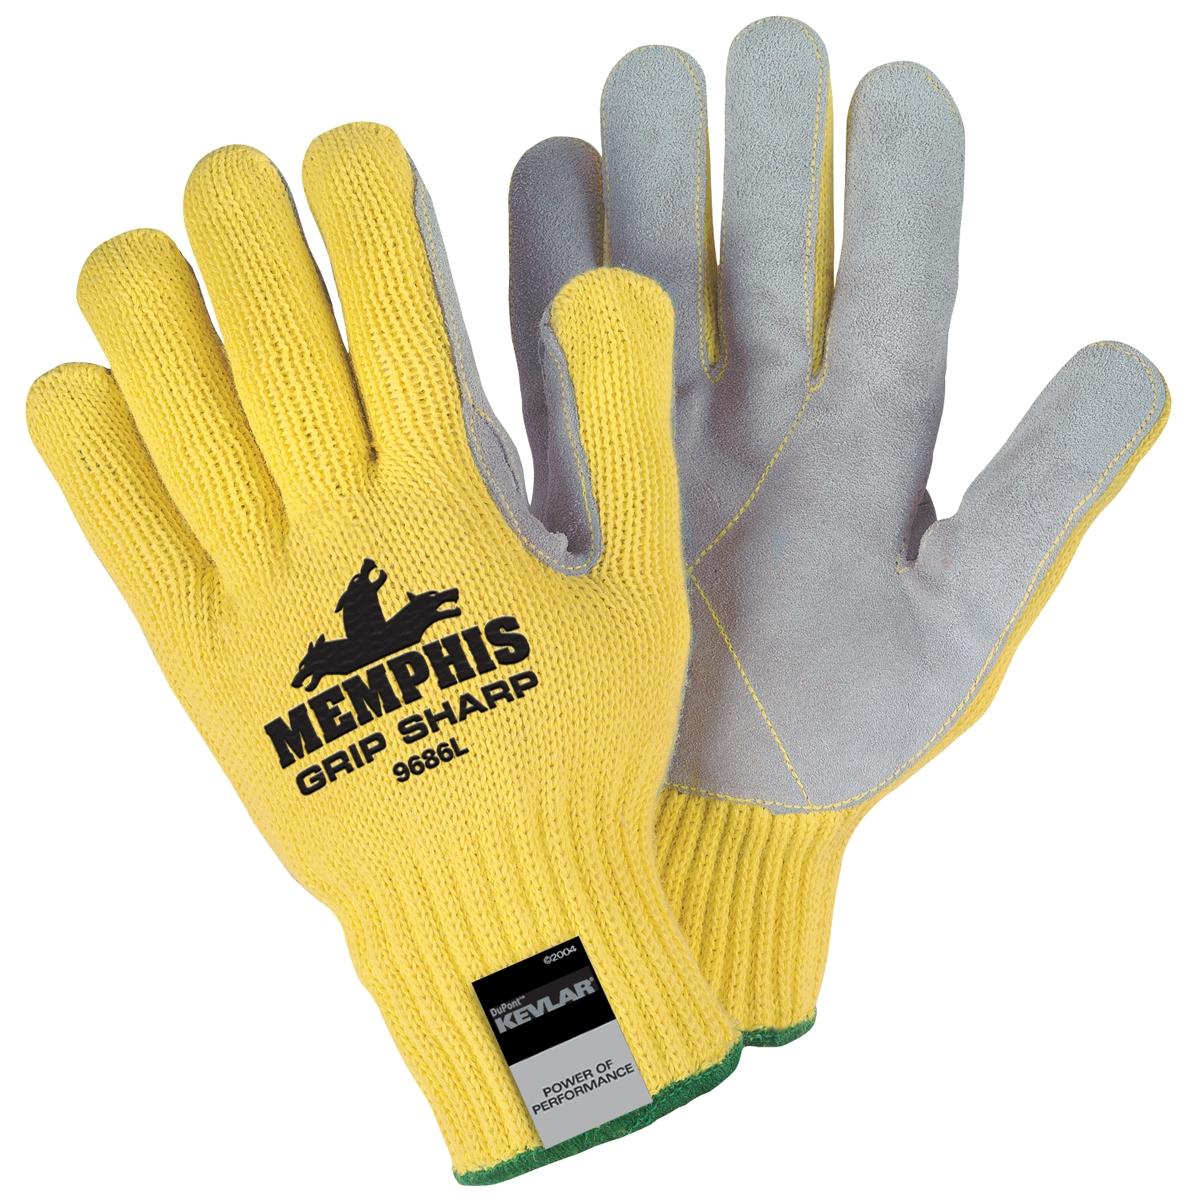 Memphis 9686 Grip Sharp Leather Palm Gloves Kevlar Shell